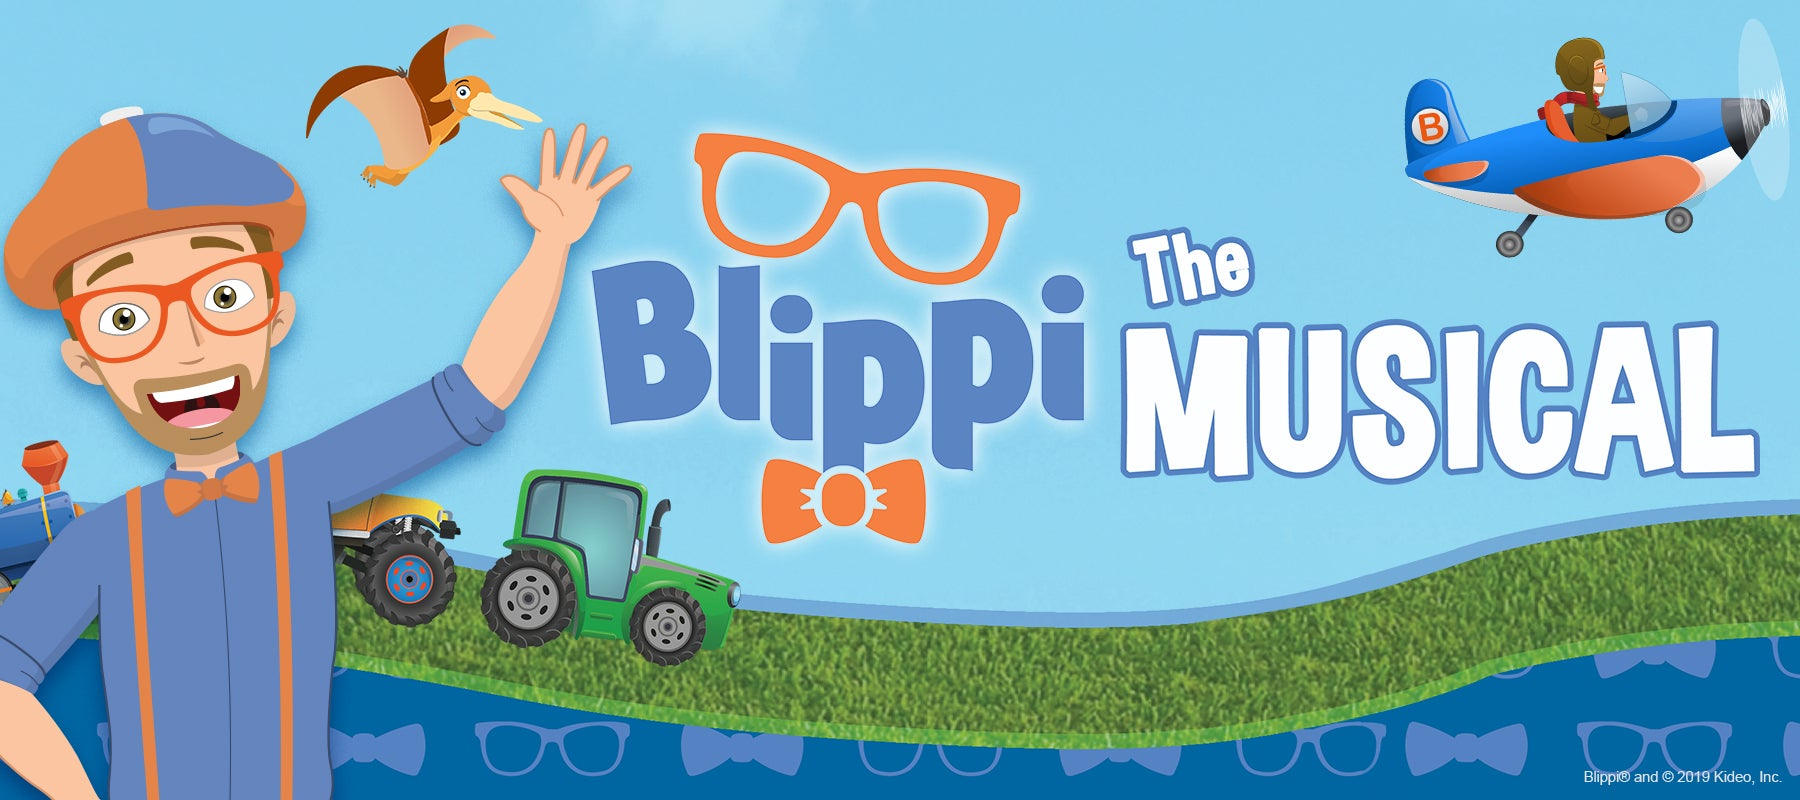 RESCHEDULED: Blippi The Musical